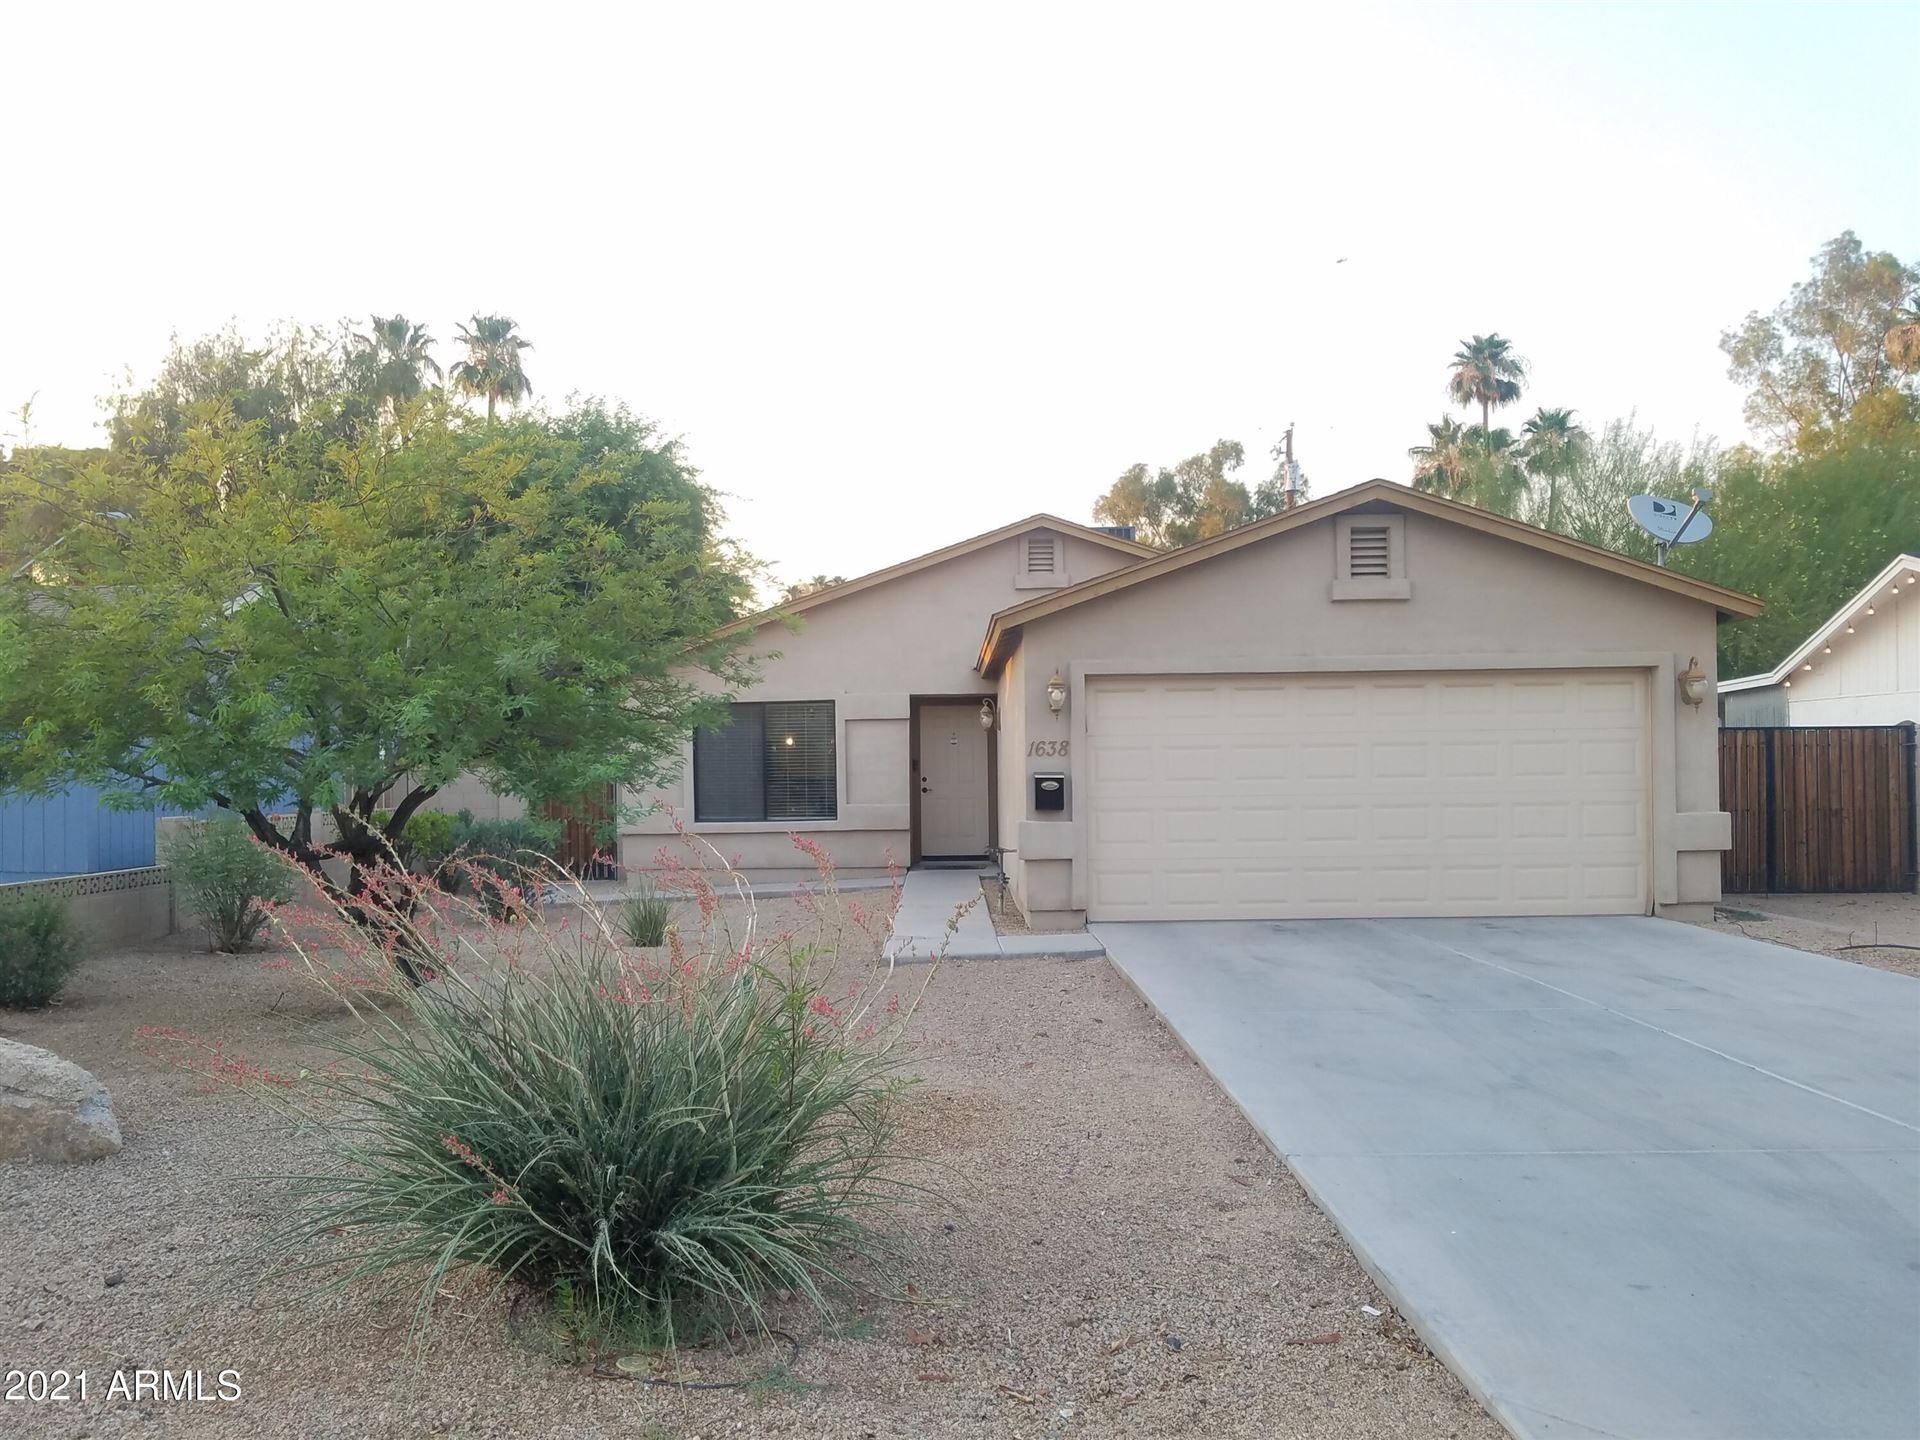 1638 E 12TH Street, Tempe, AZ 85281 - MLS#: 6263331